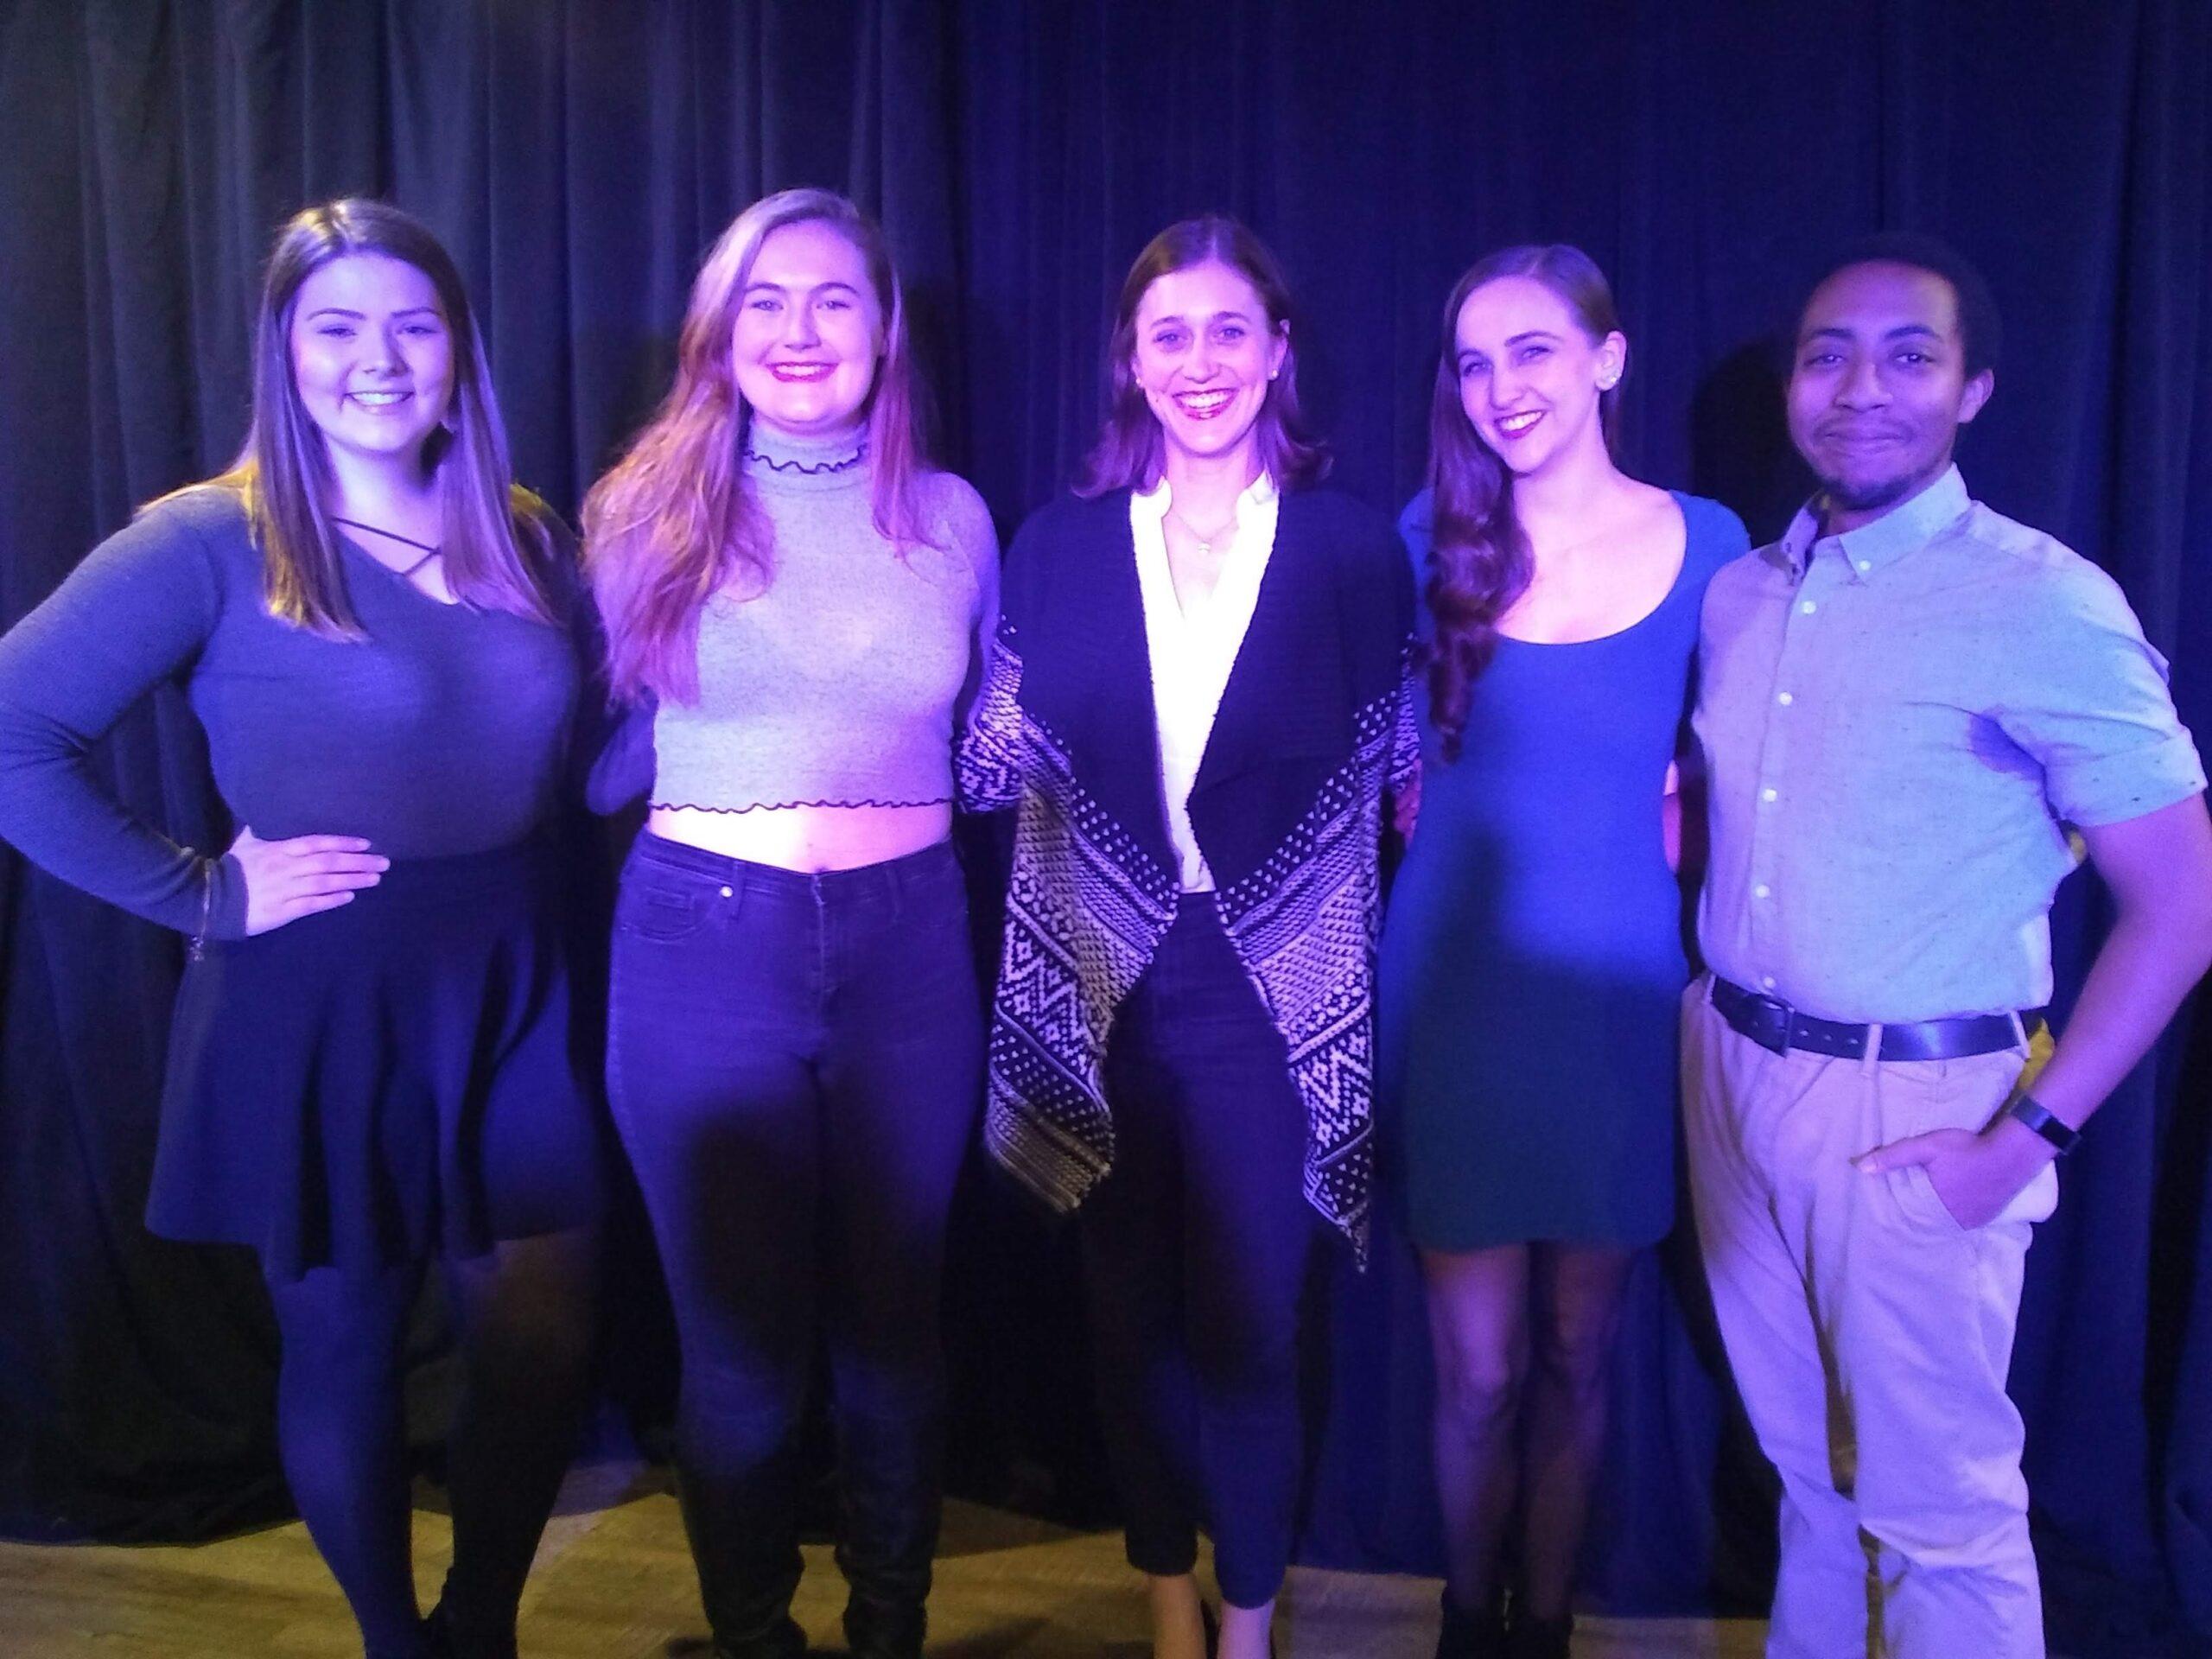 Kayleigh LaGrutta, Maggie Bambic, Julia Kershetsky, Rachel Dalton, Keith Livingston at Starling Voice Cabaret, 2018